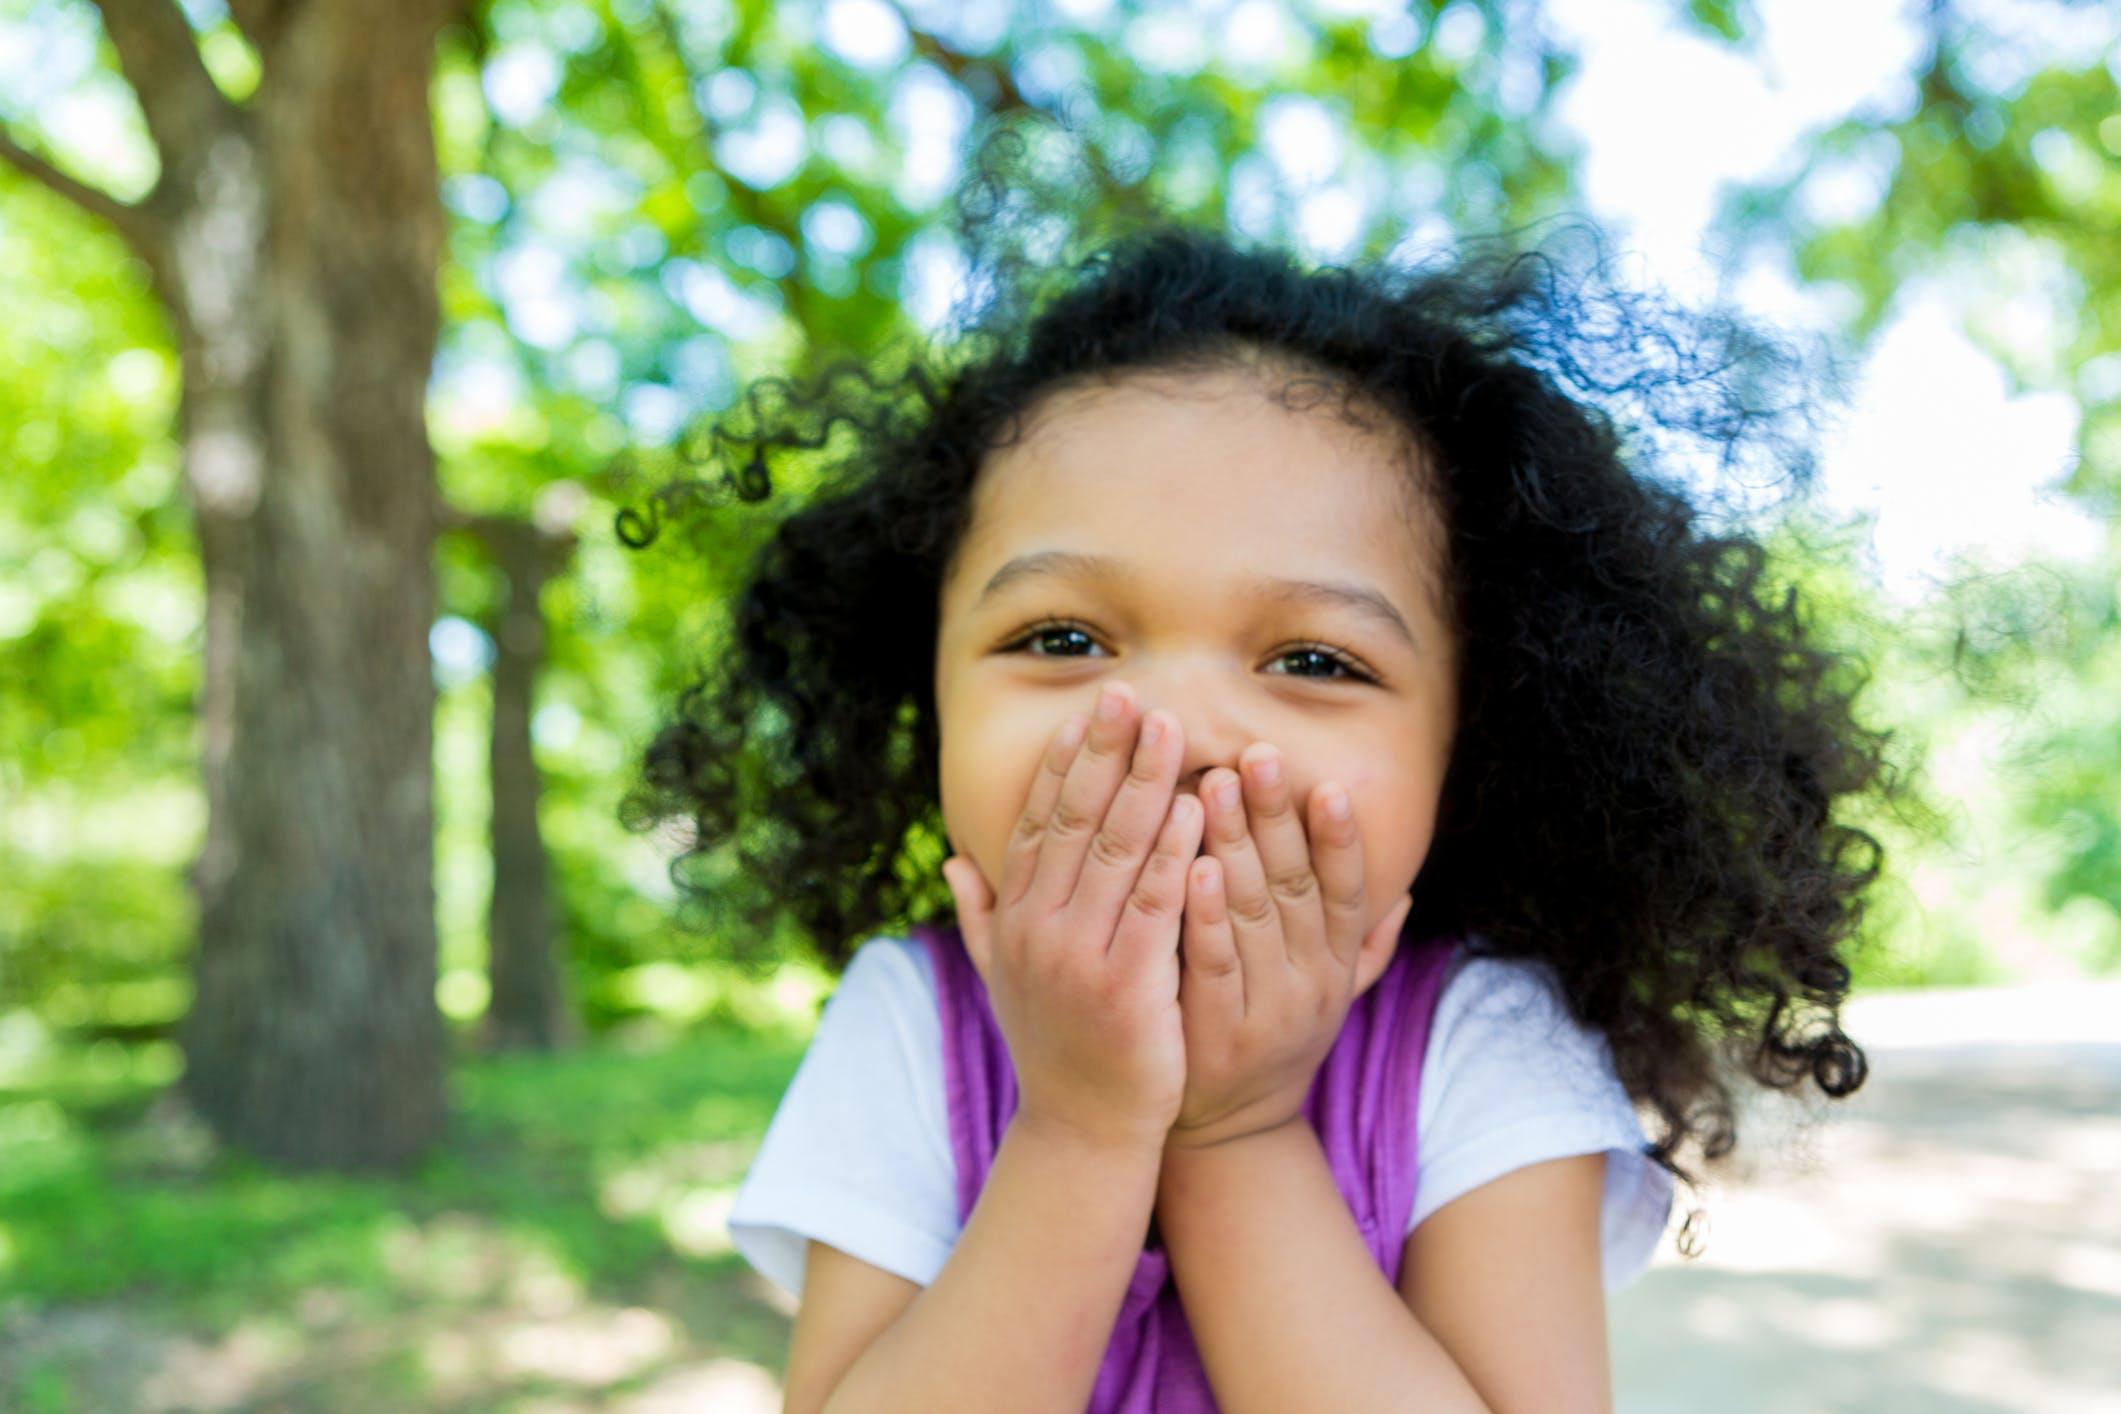 Funny girl black holding back laugh.jpg?ixlib=rails 3.0